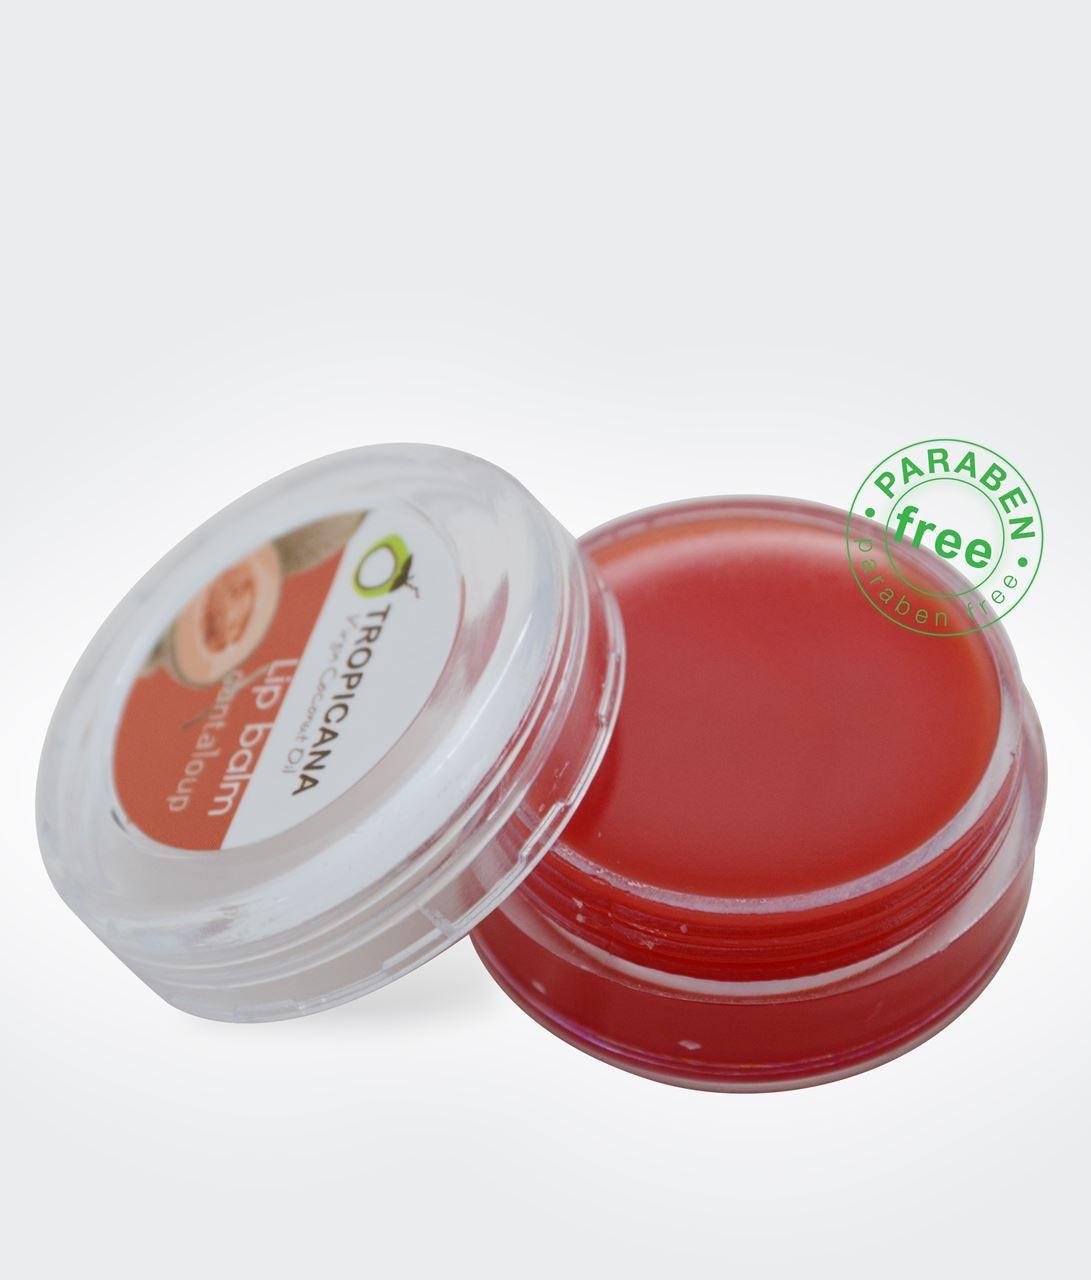 Thai Herbal At Home : Natural Herbal Virgin Coconut Oil Lip Balm 10 g.